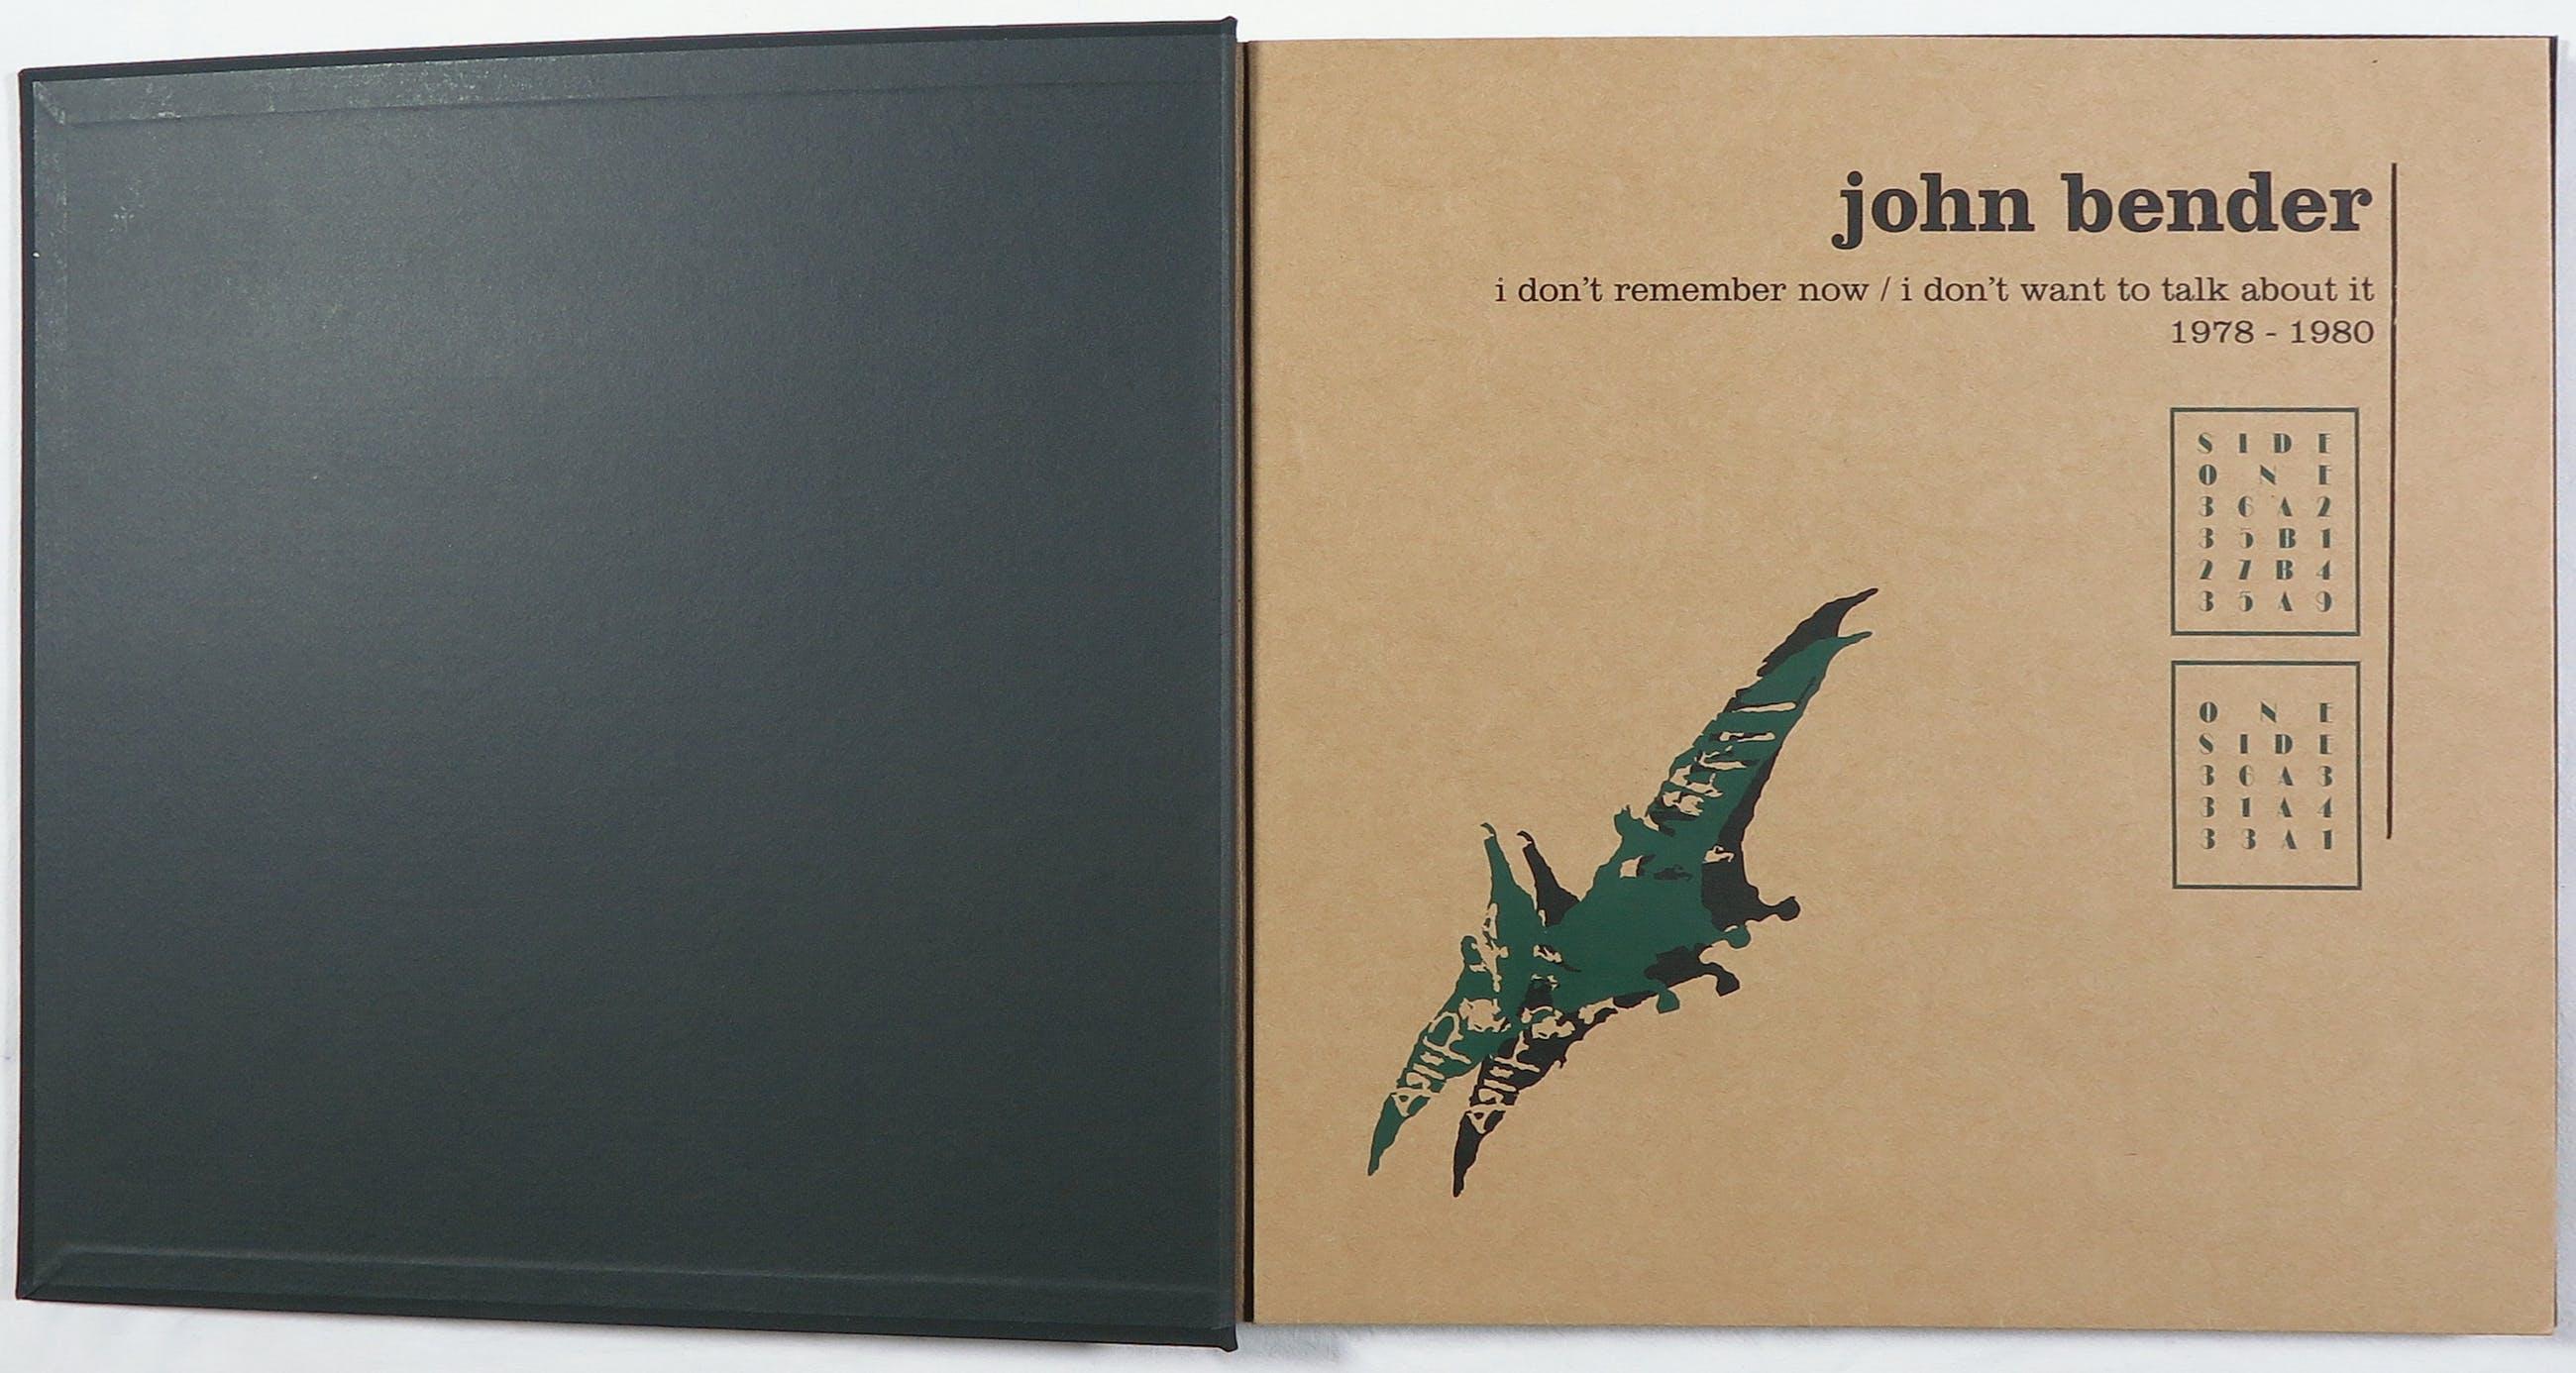 John Bender - Box - Memories of Mindless Mechanical Monologues - Friends edition op rood vinyl kopen? Bied vanaf 180!